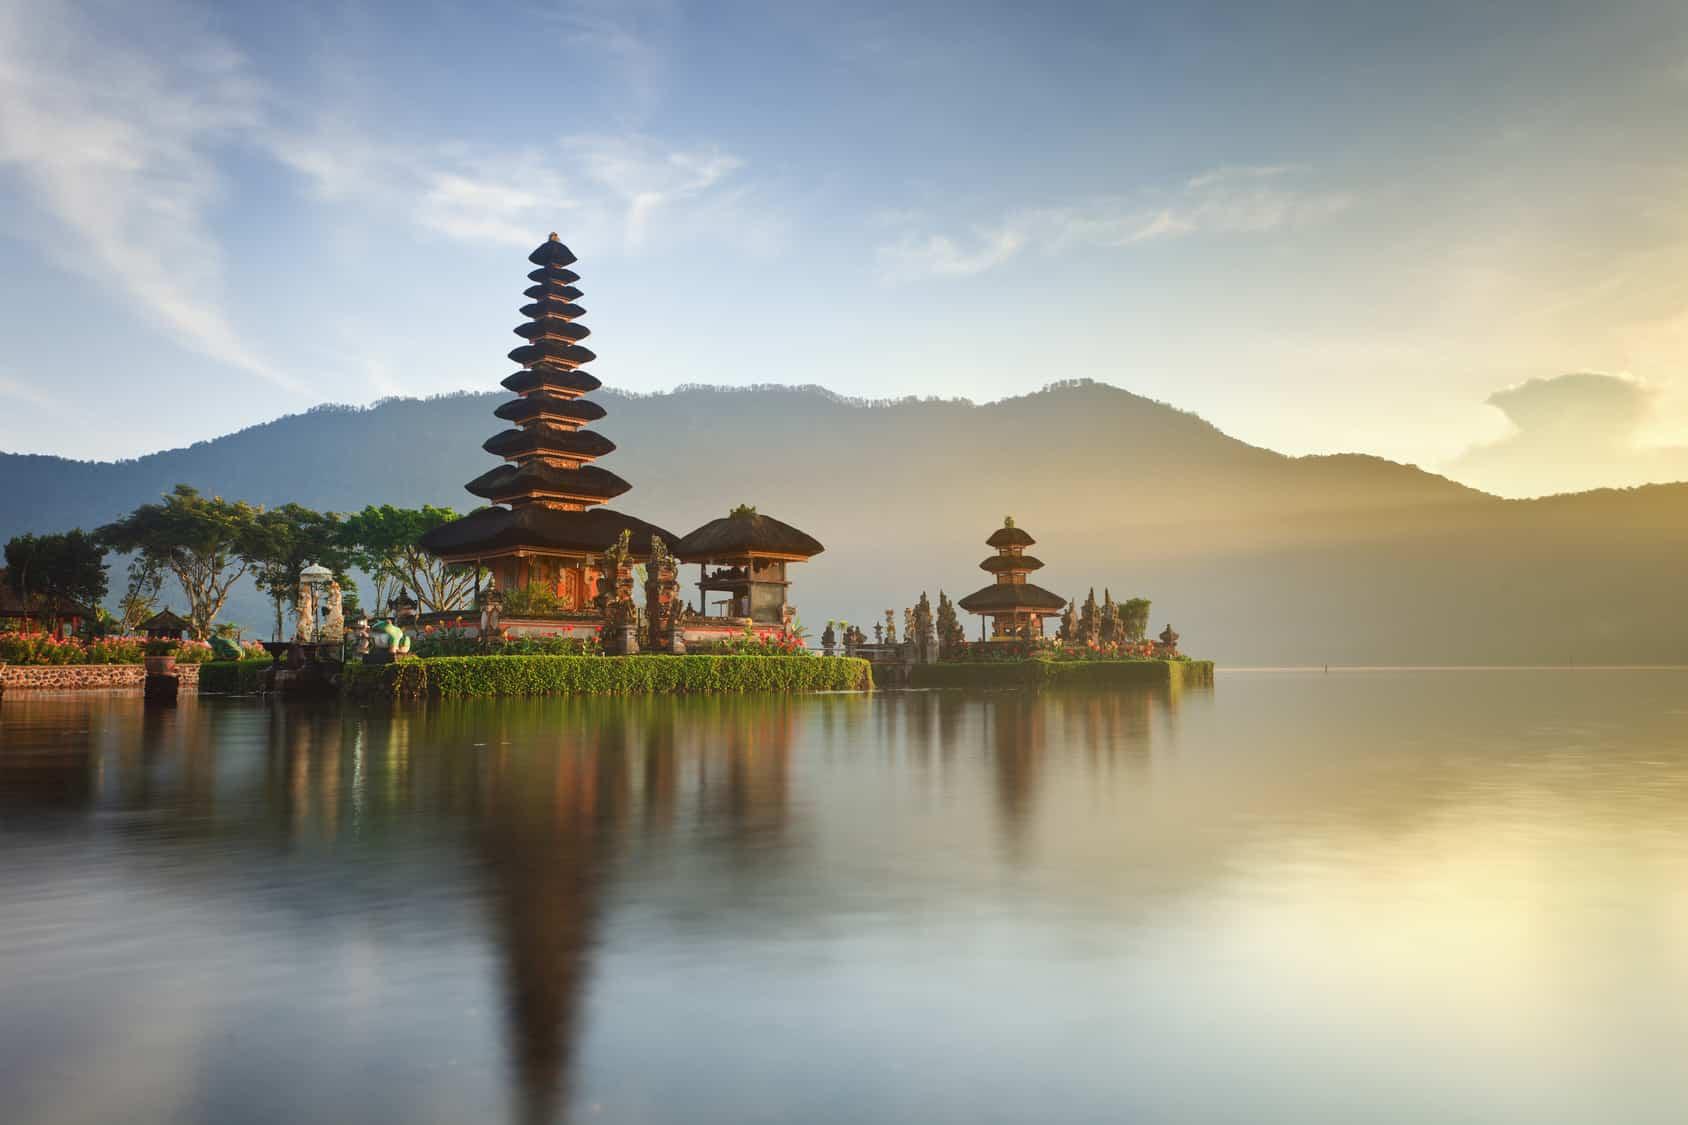 Ulun Danu Tempel, Bali, Indonesia